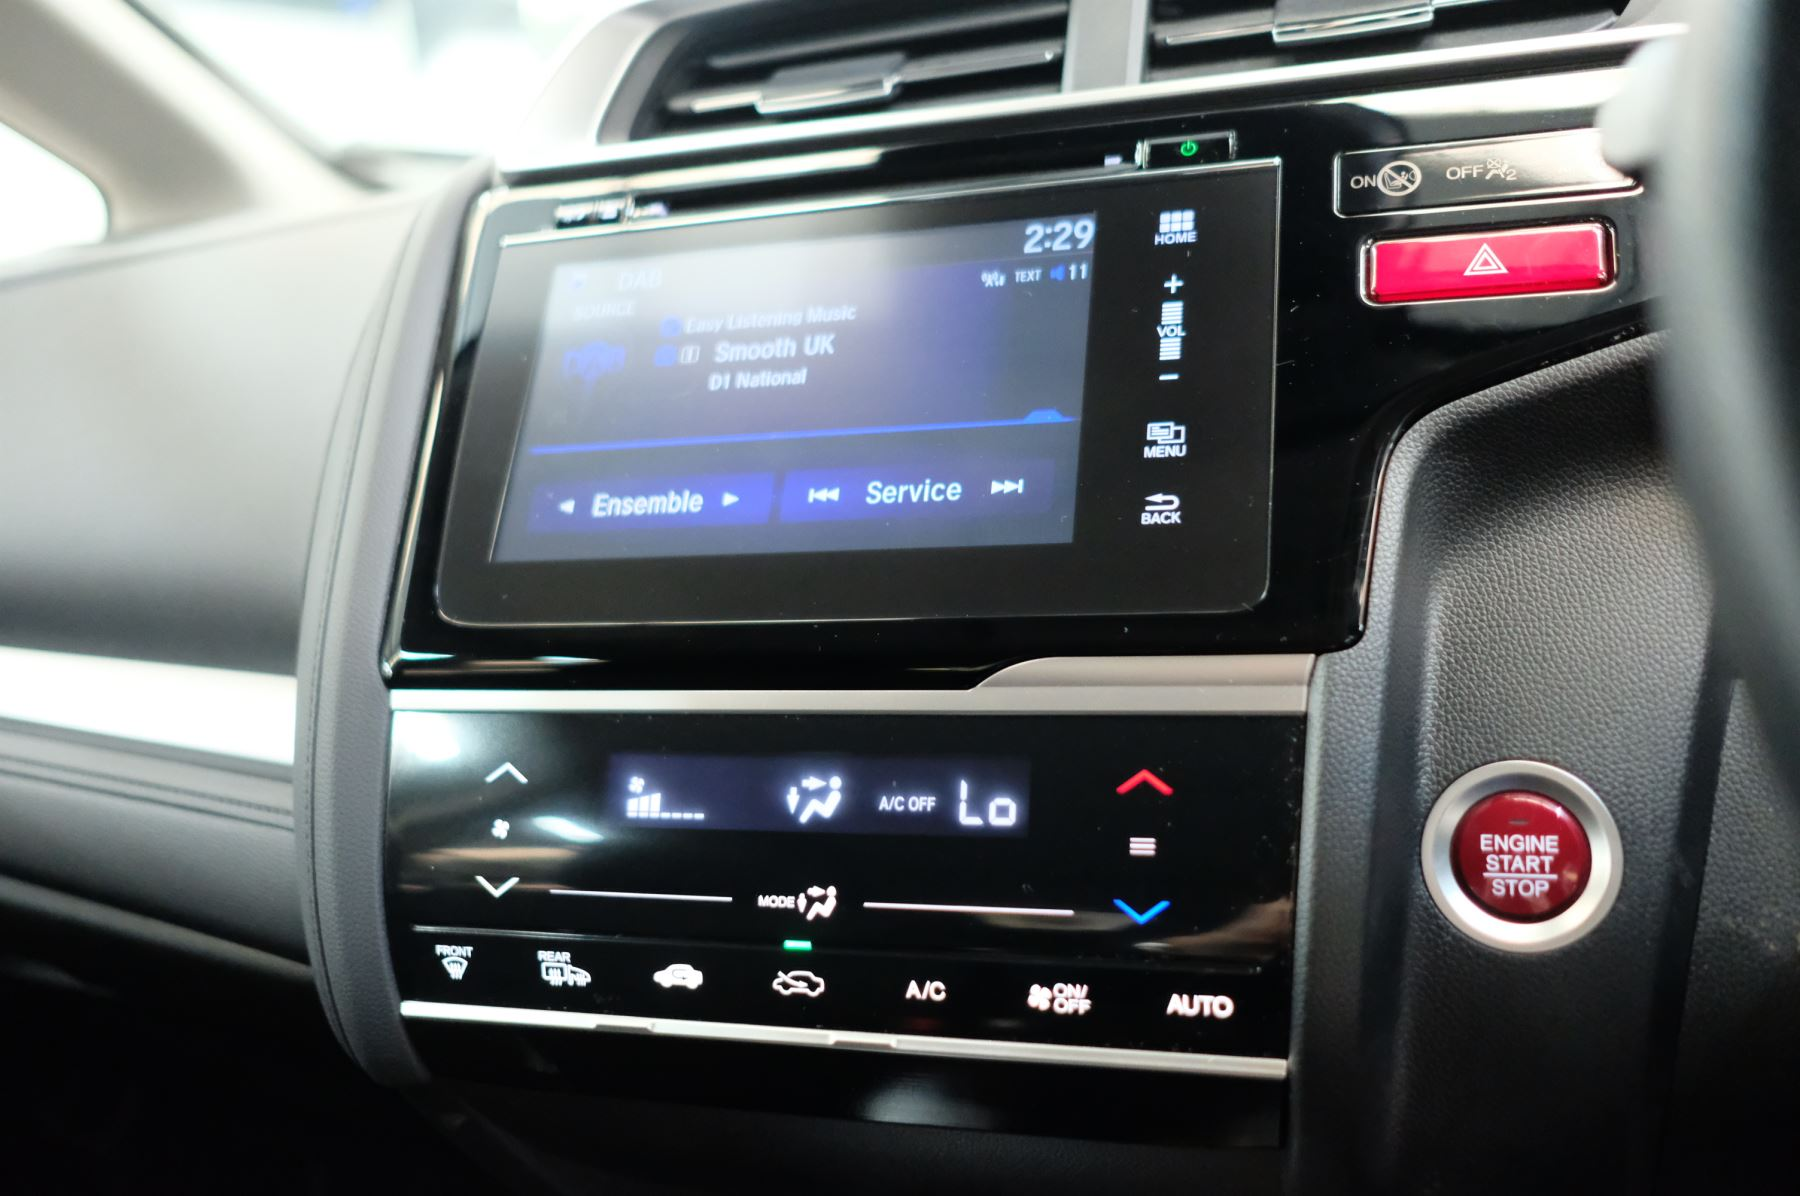 Honda Jazz 1.3 EX 5dr image 25